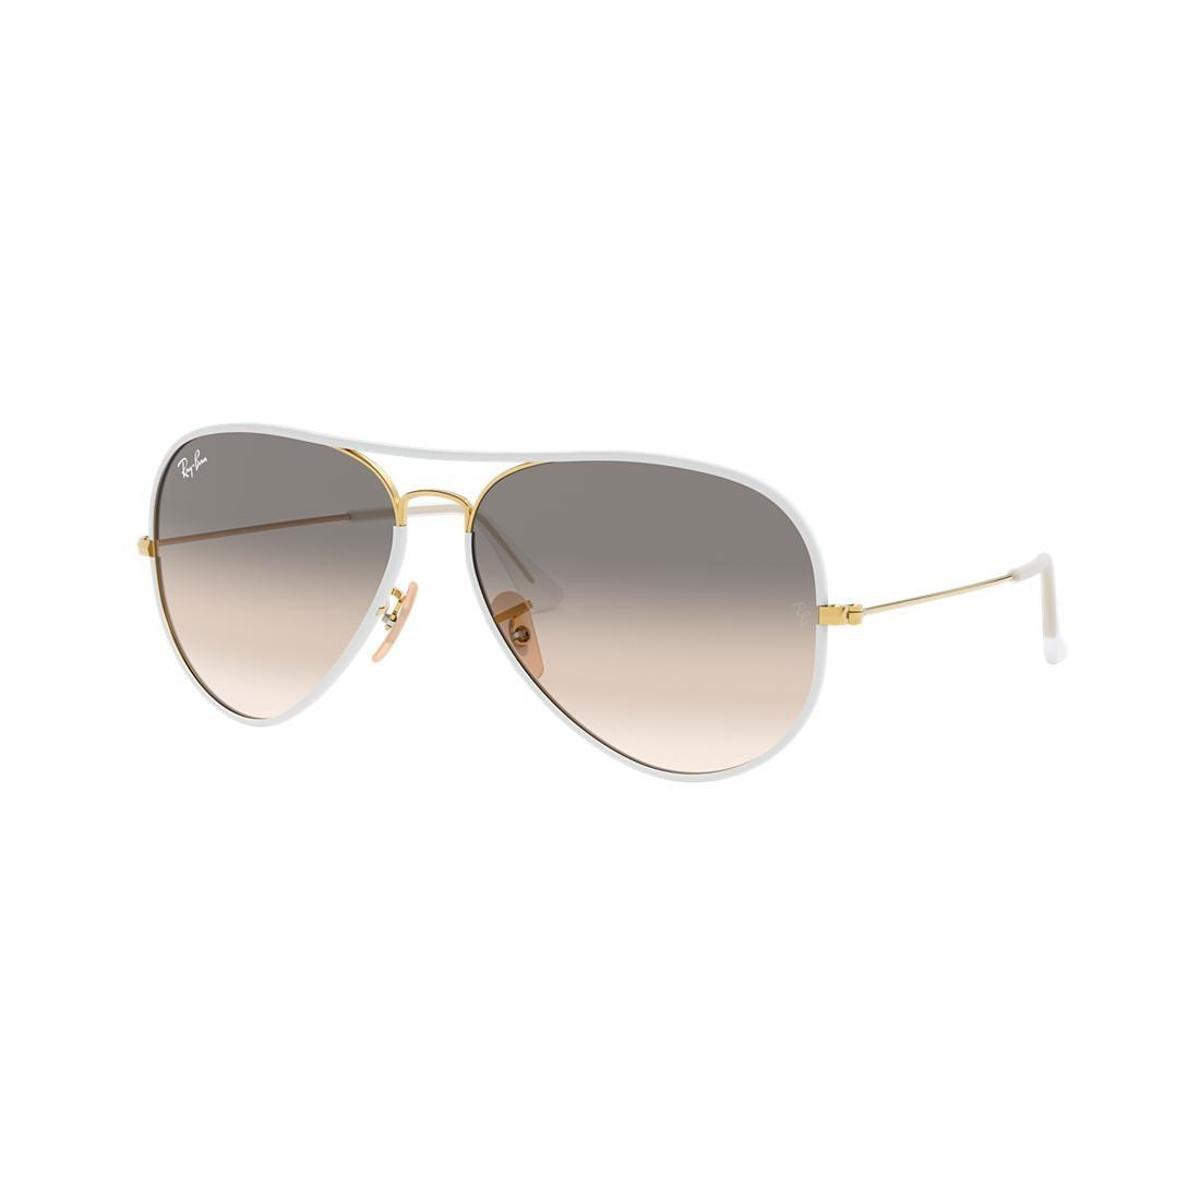 3839dc65b Óculos de Sol Ray-Ban RB3025JM Aviator Full Color | Zattini